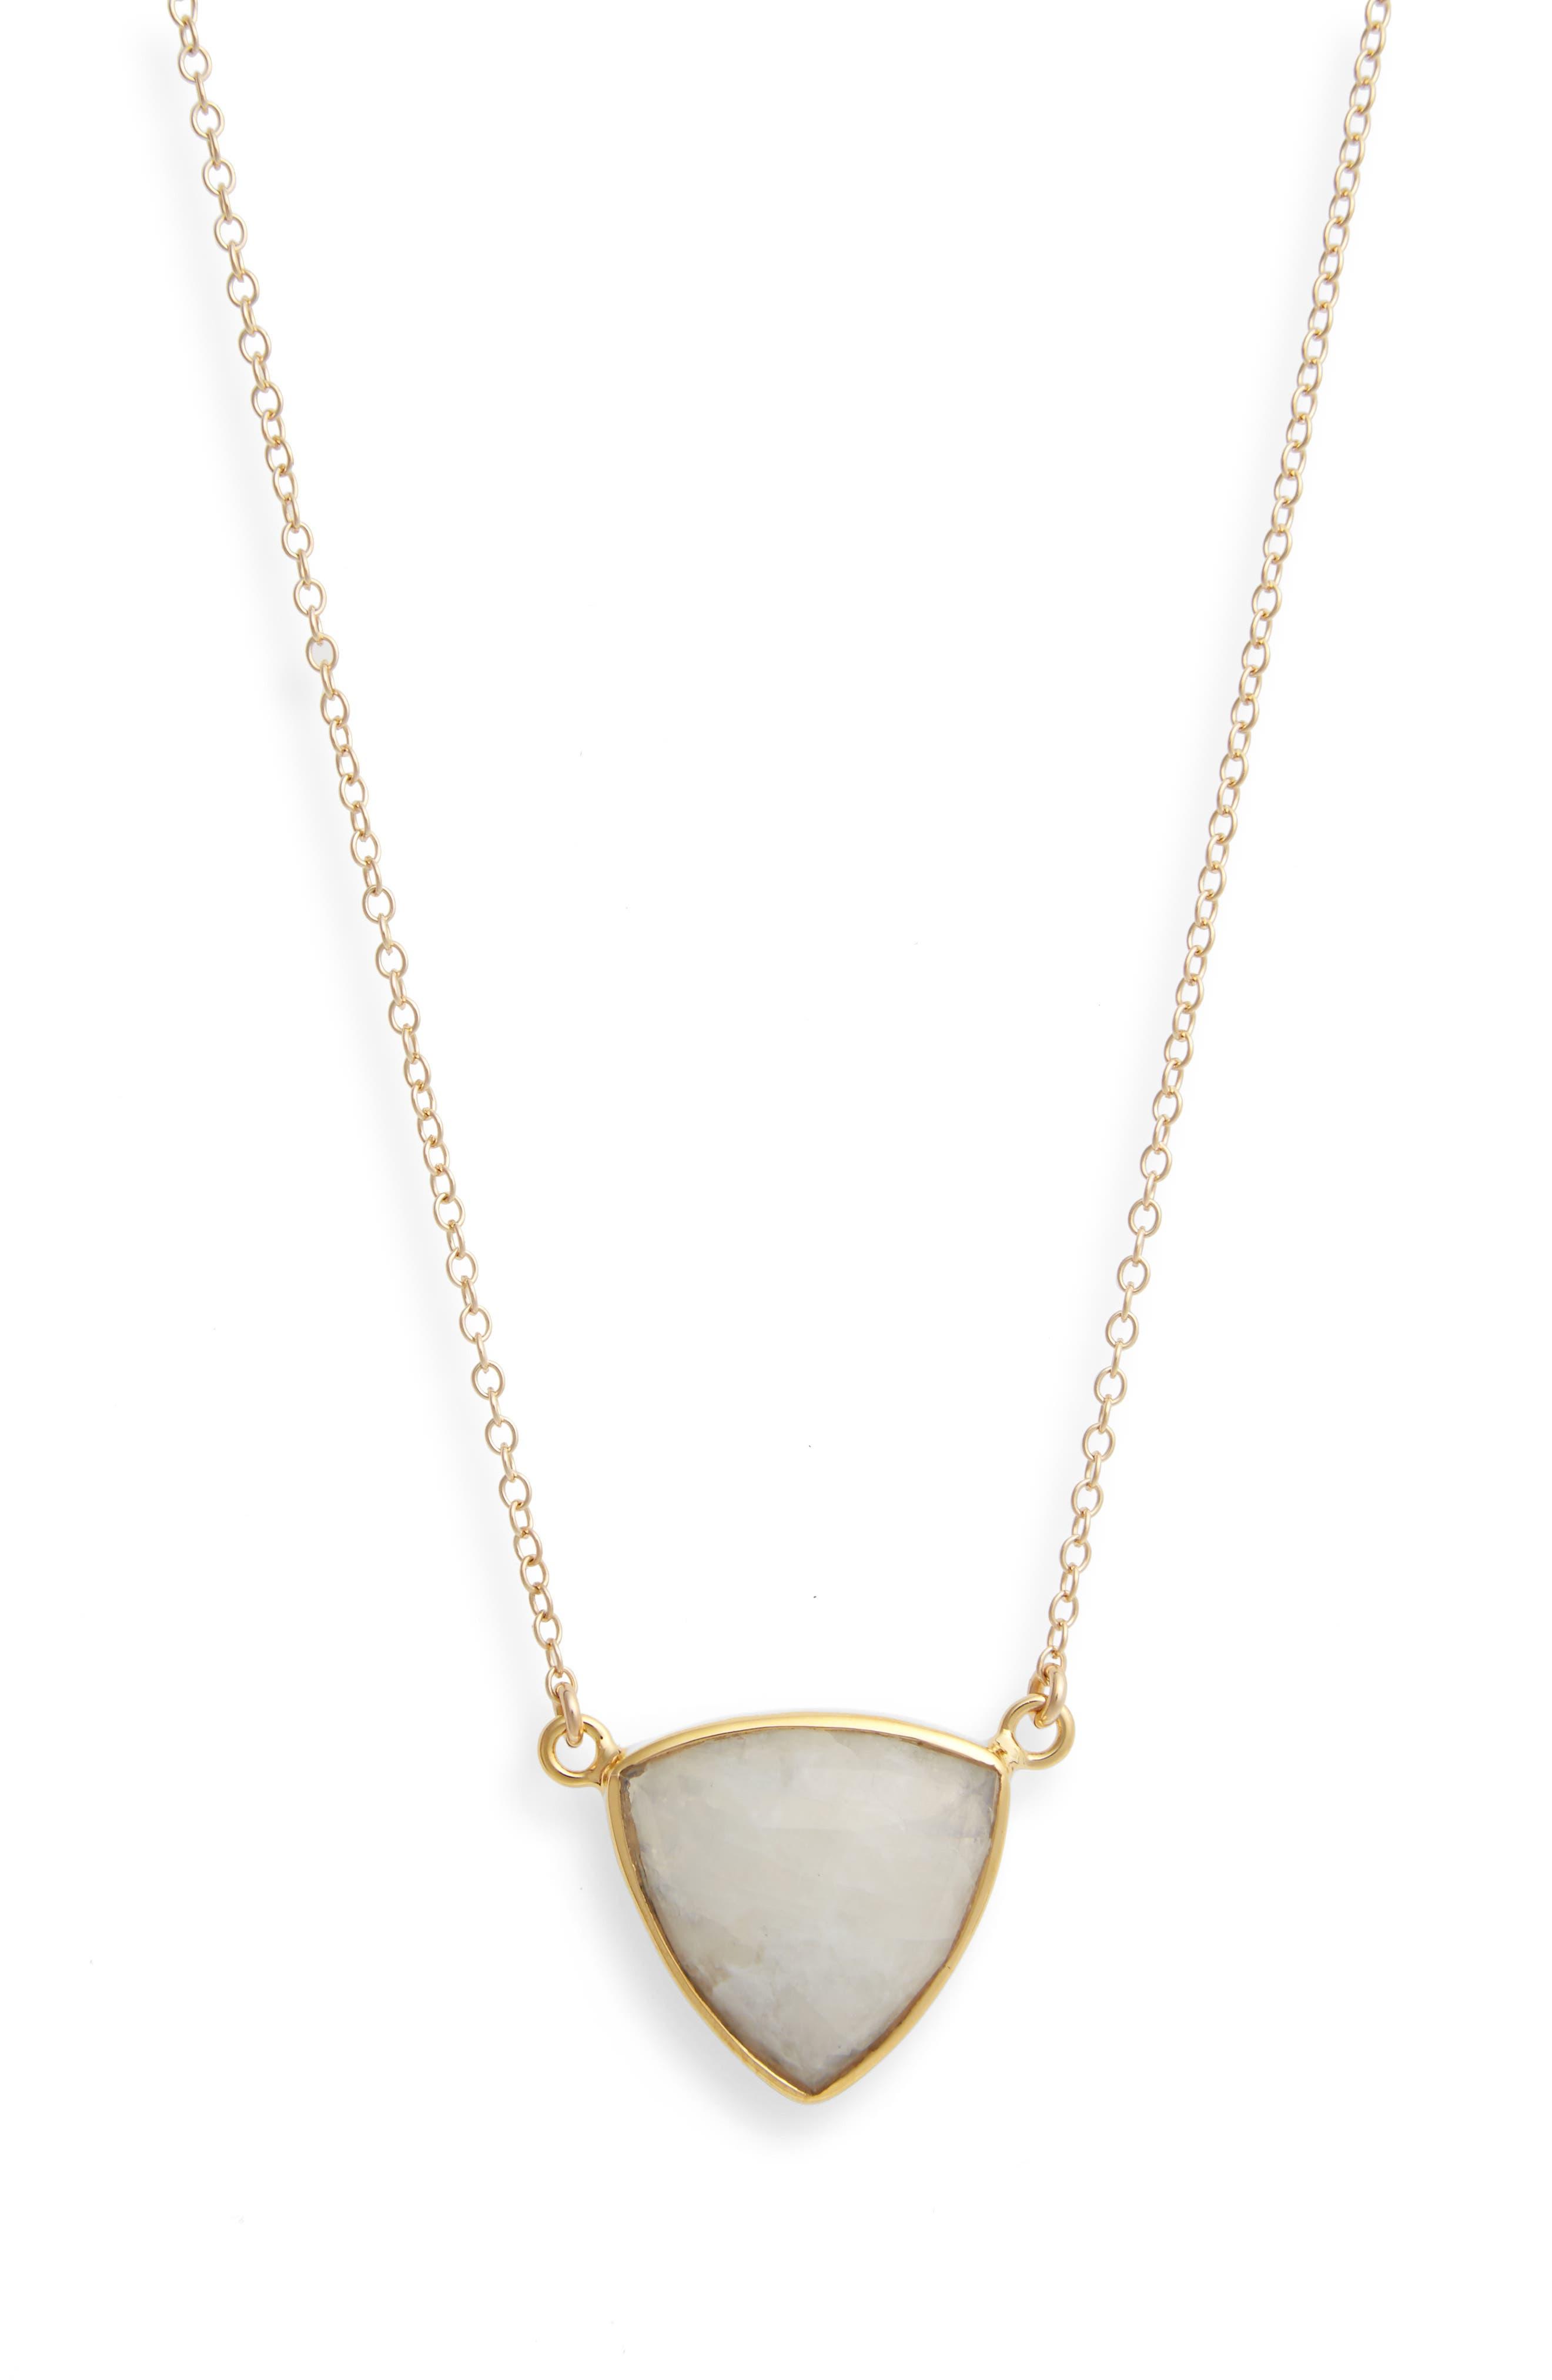 Leah Alexandra Trillium Pendant Necklace